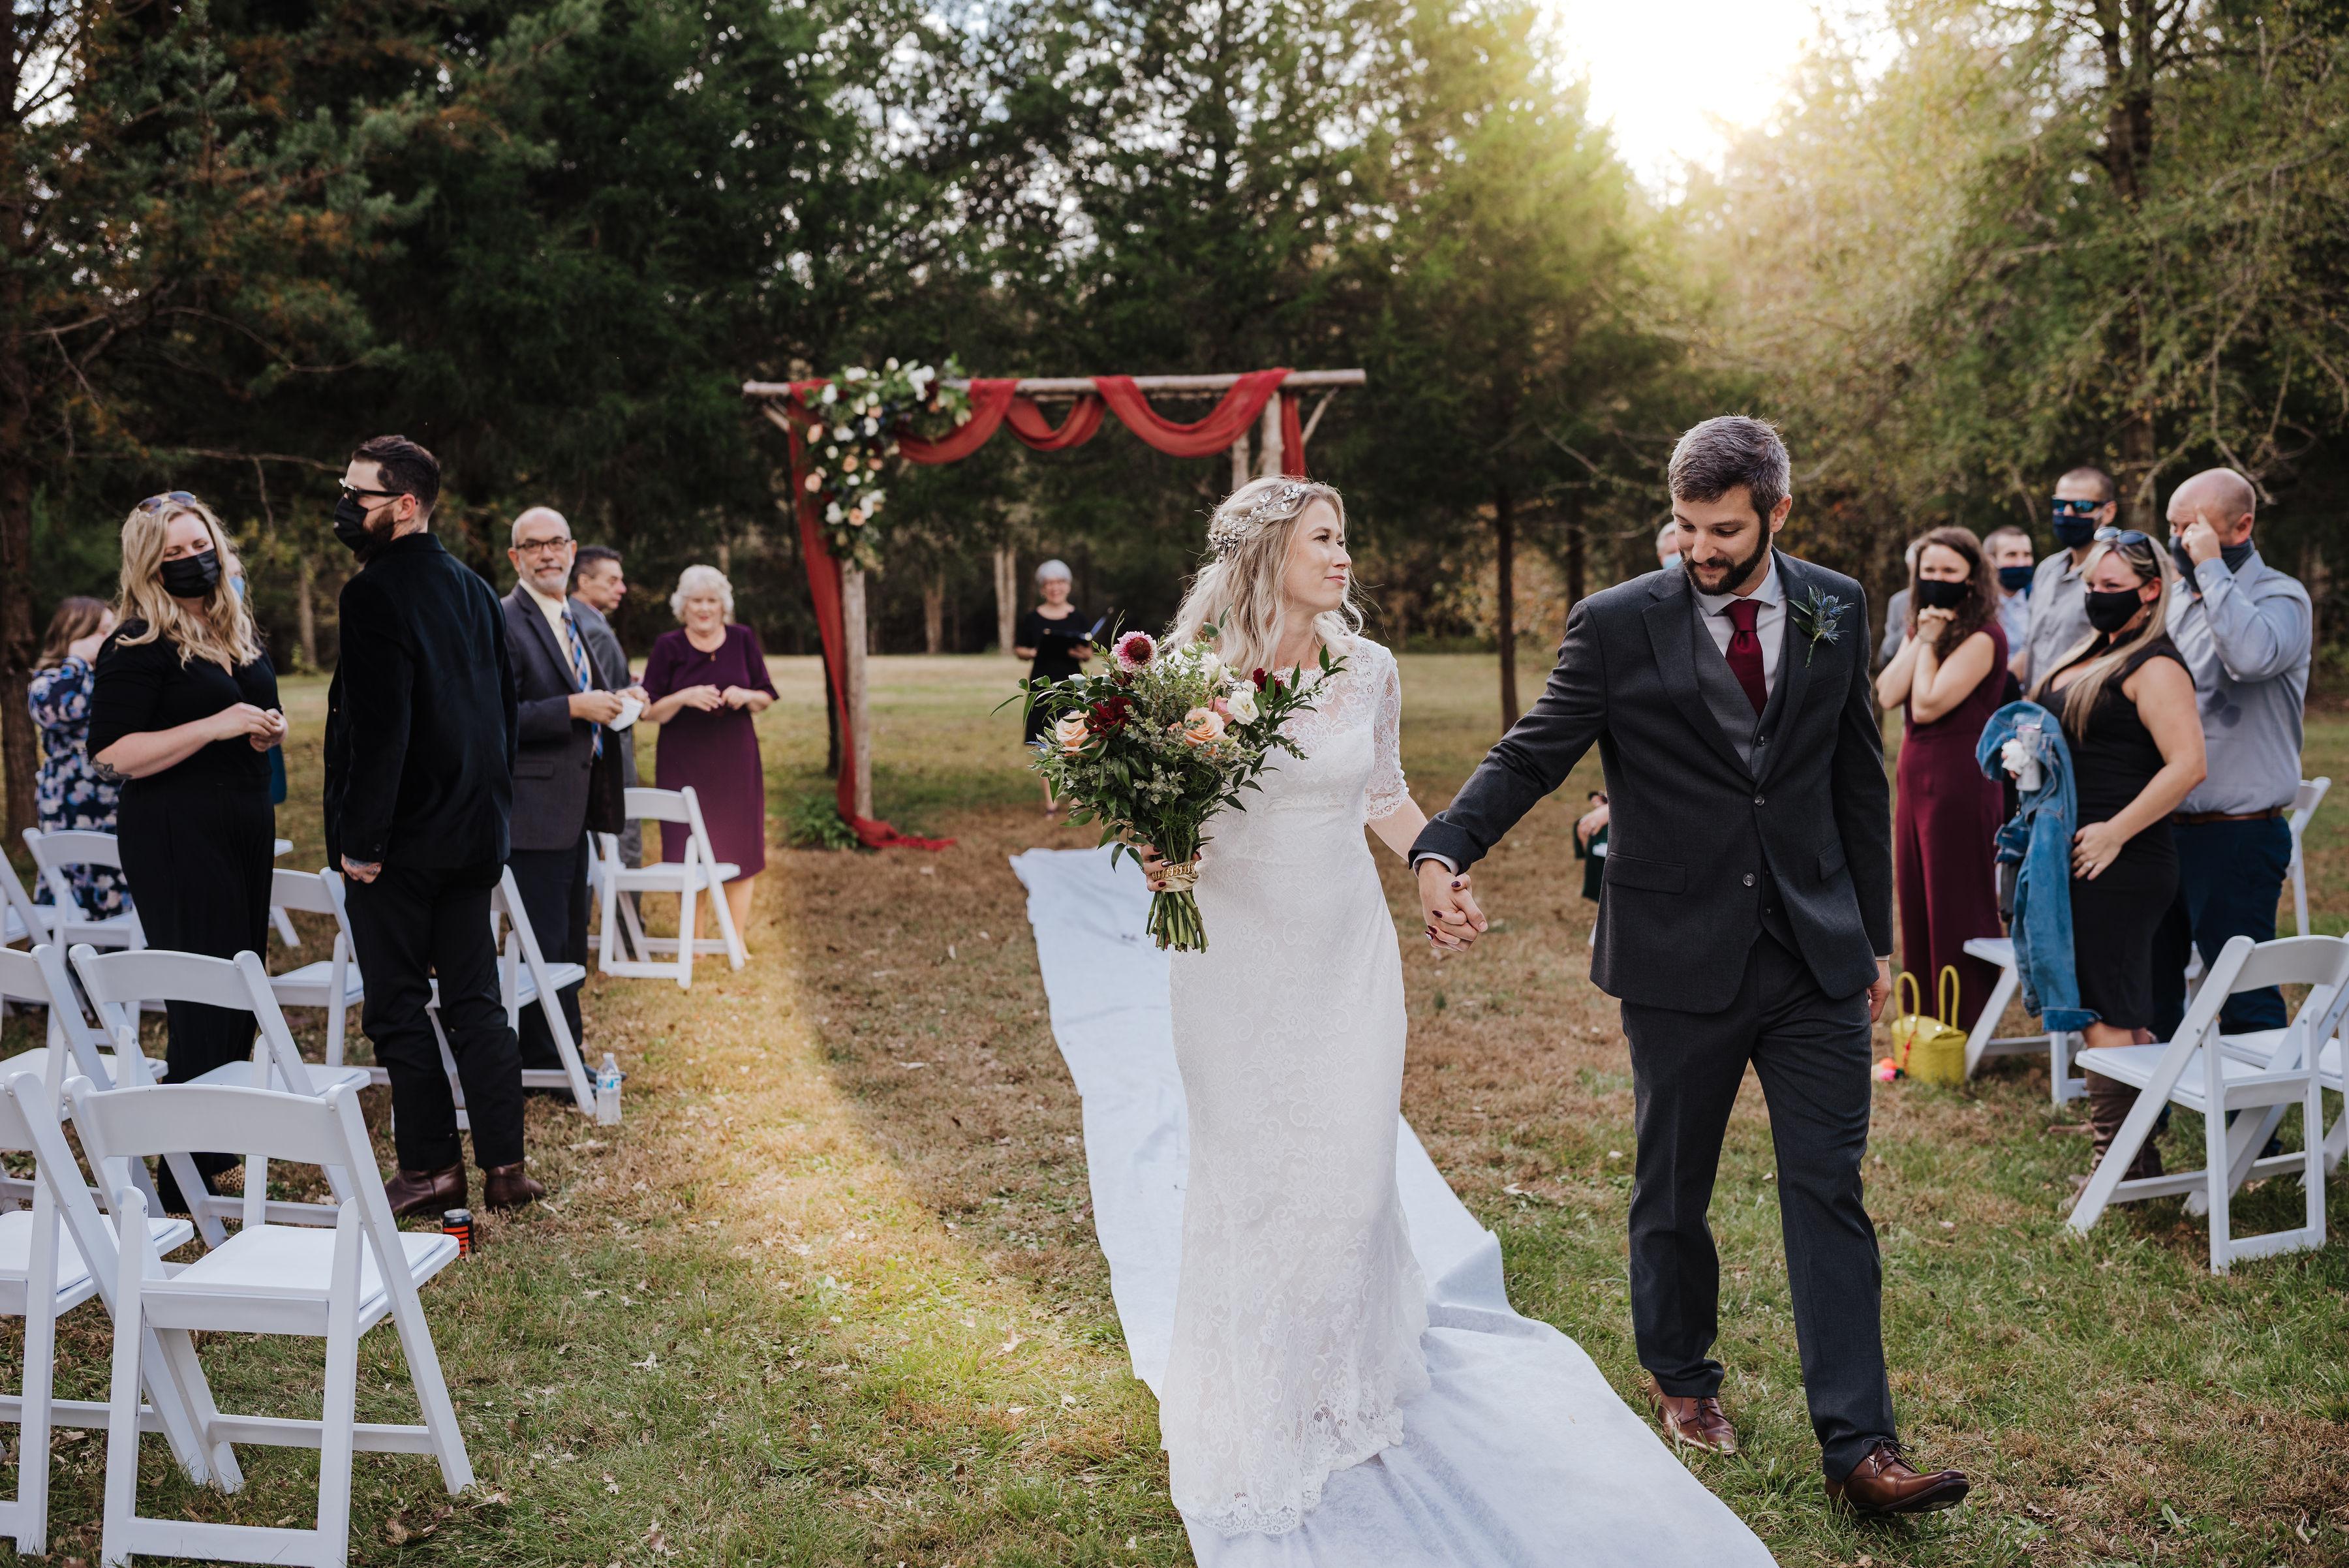 sunset wedding ceremony at small intimate wedding